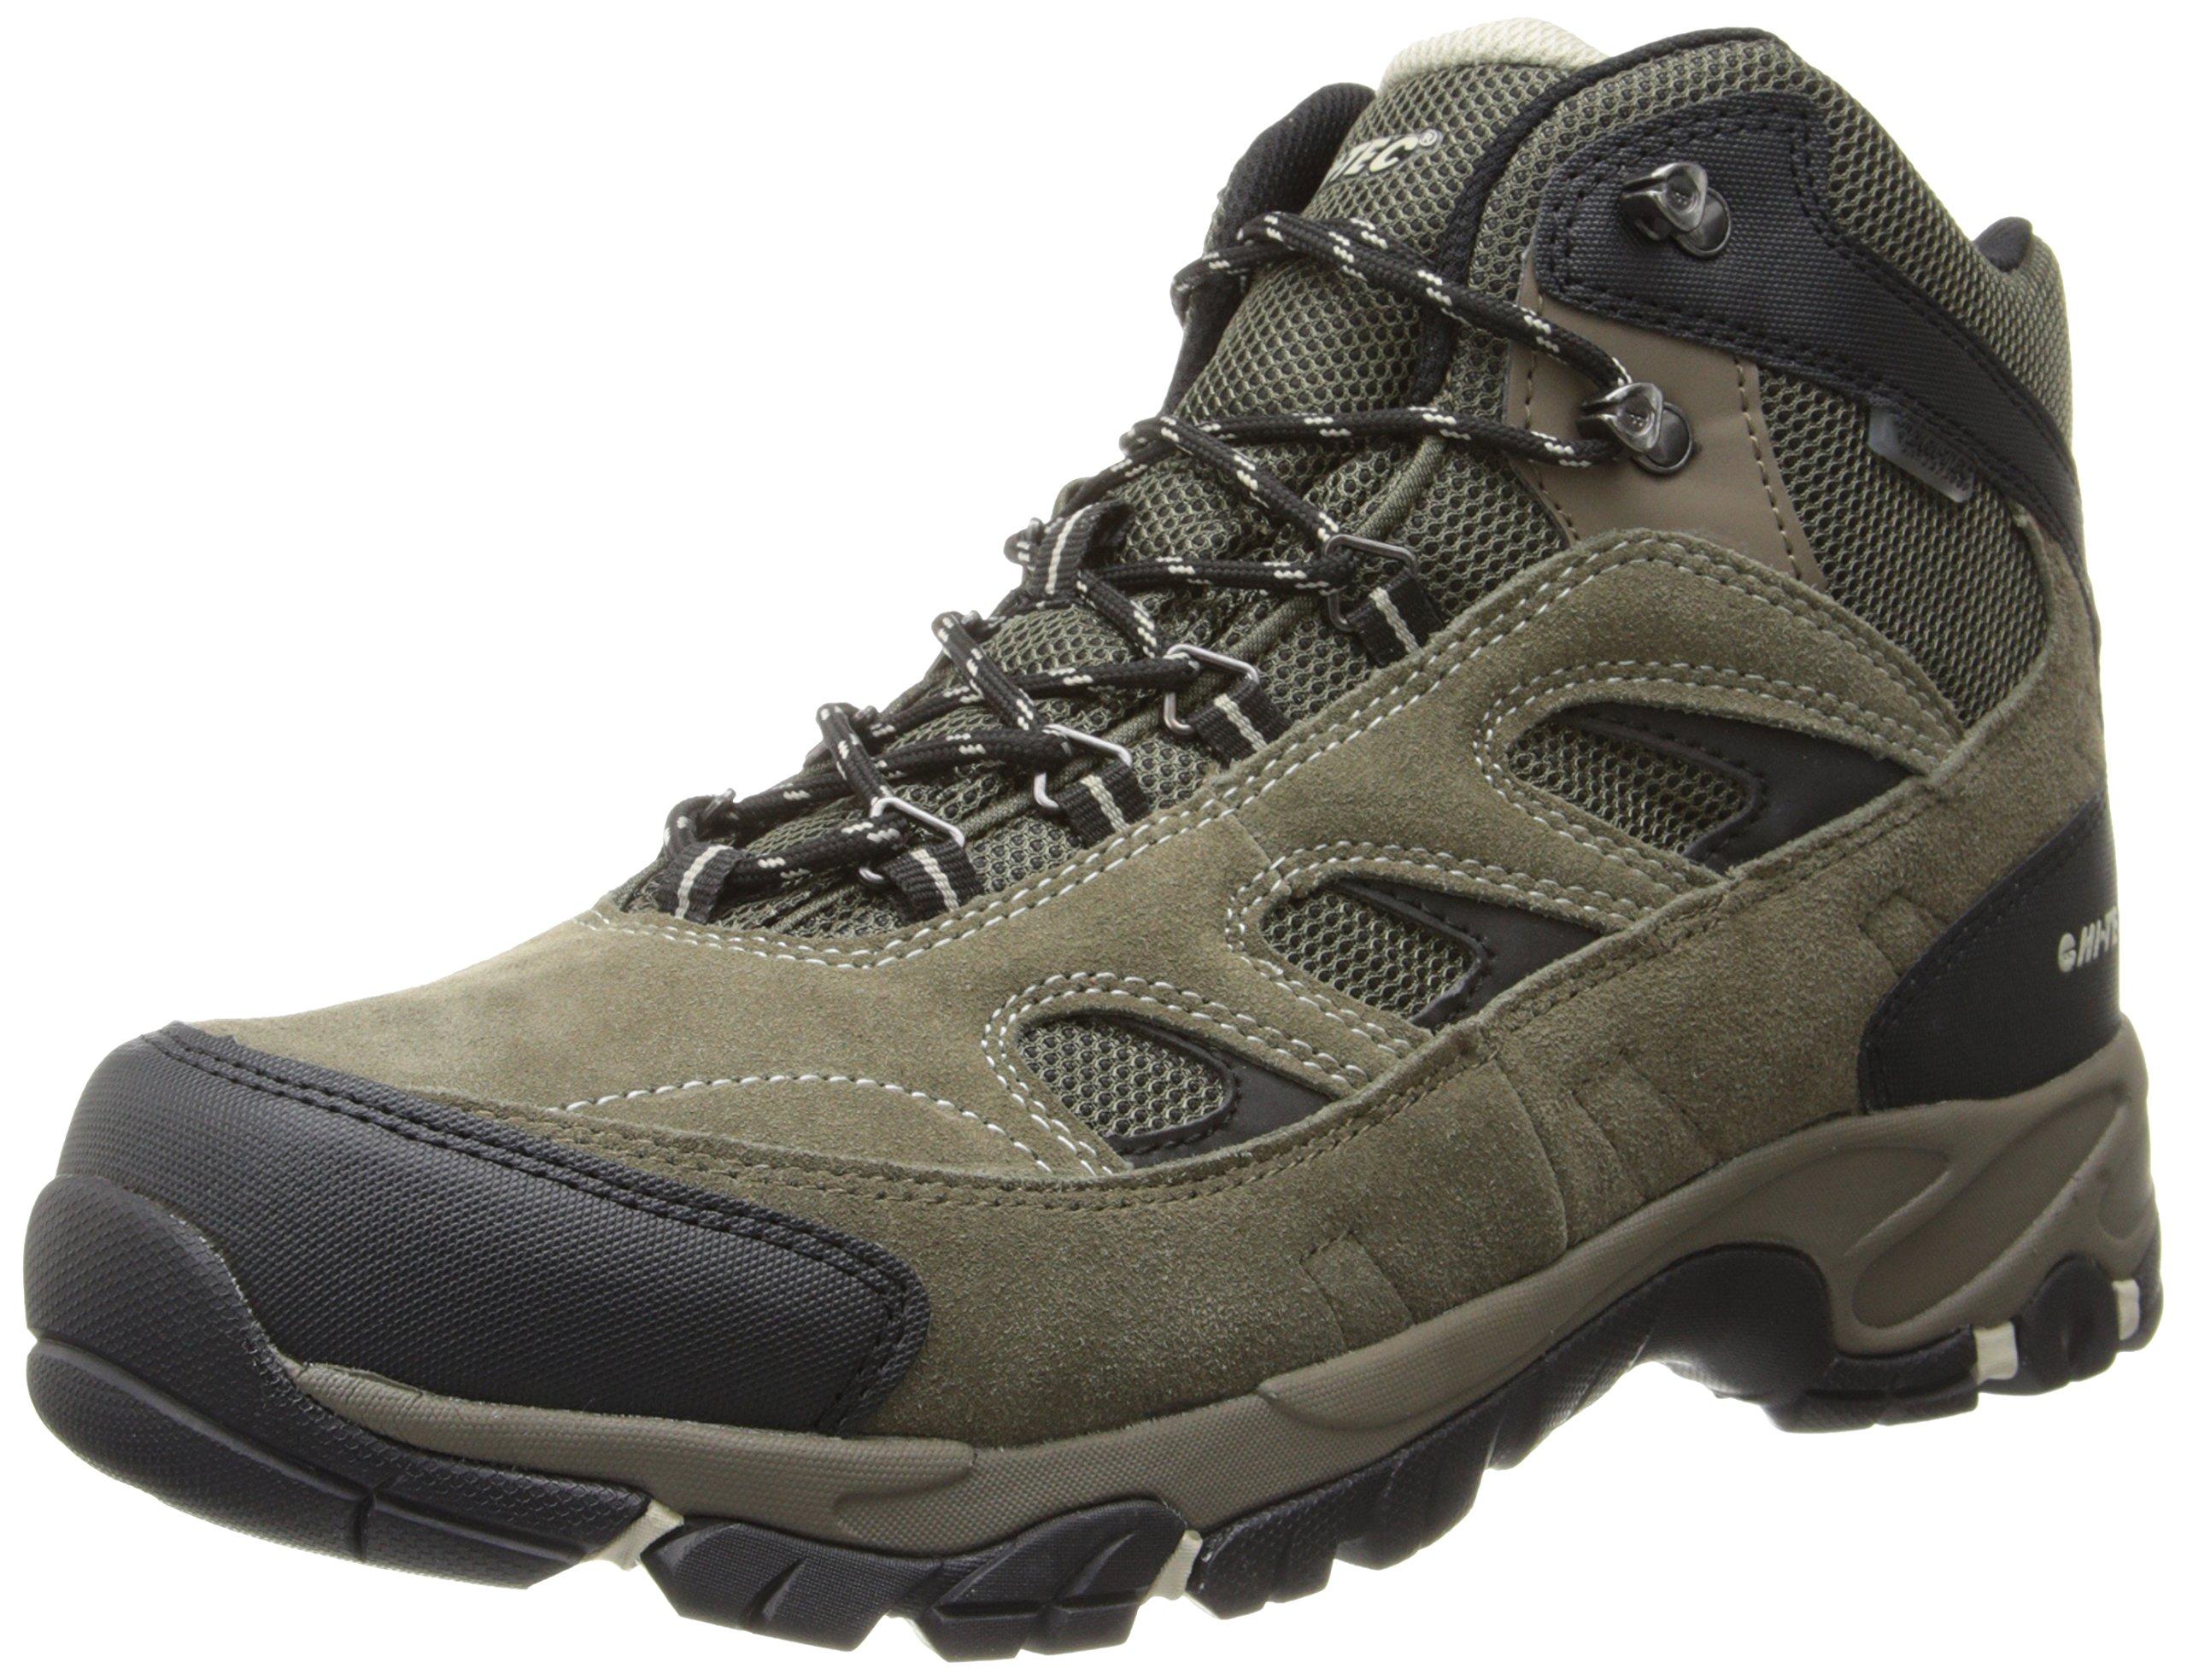 Hi-Tec Men's Logan Waterproof Hiking Boot,Smokey Brown/Olive/Snow,9 M US